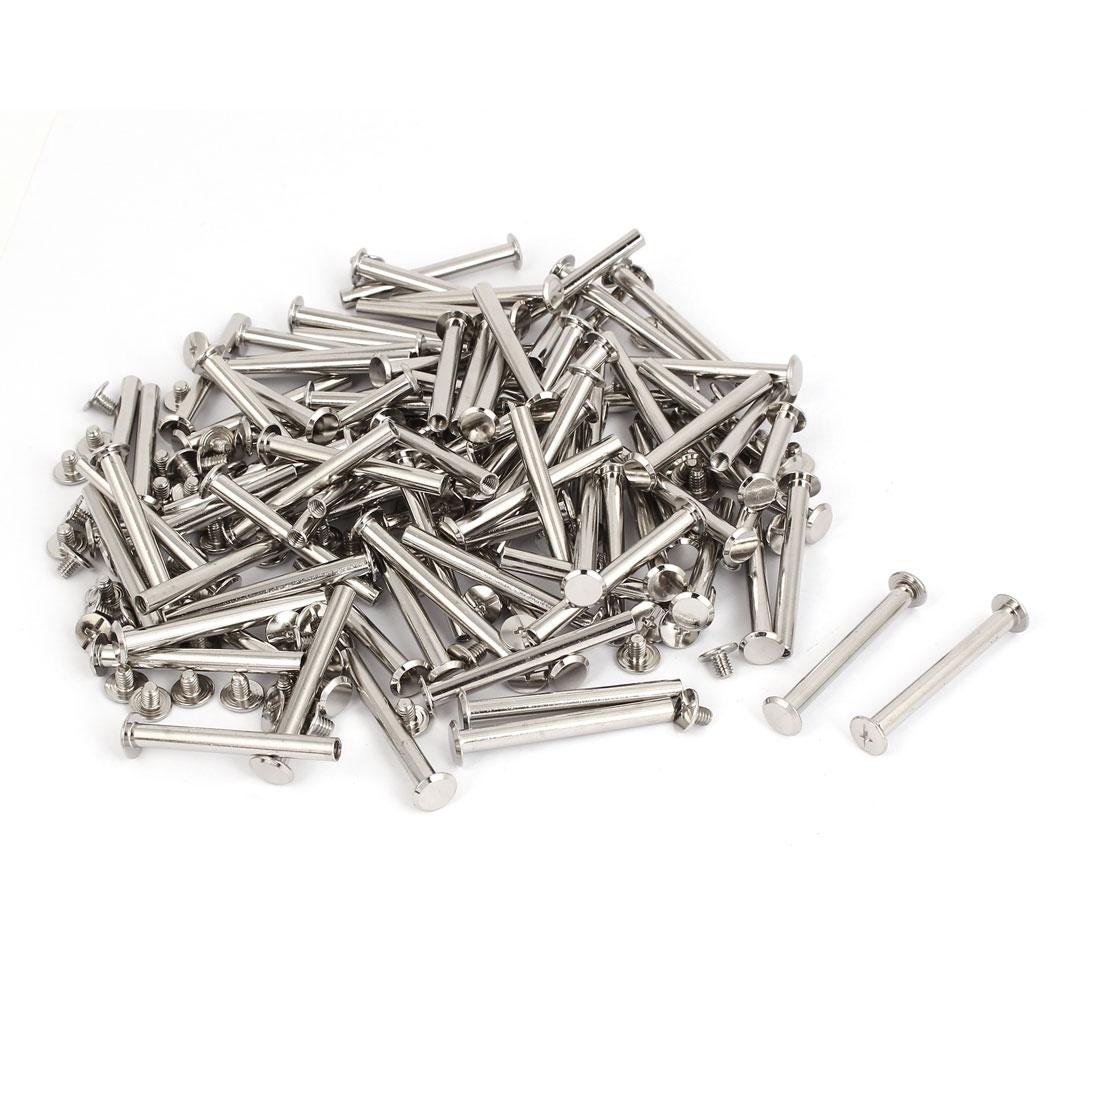 M5x45mm Leather Craft Belt Metal Nail Rivets Chicago Screws Binding Post 100pcs